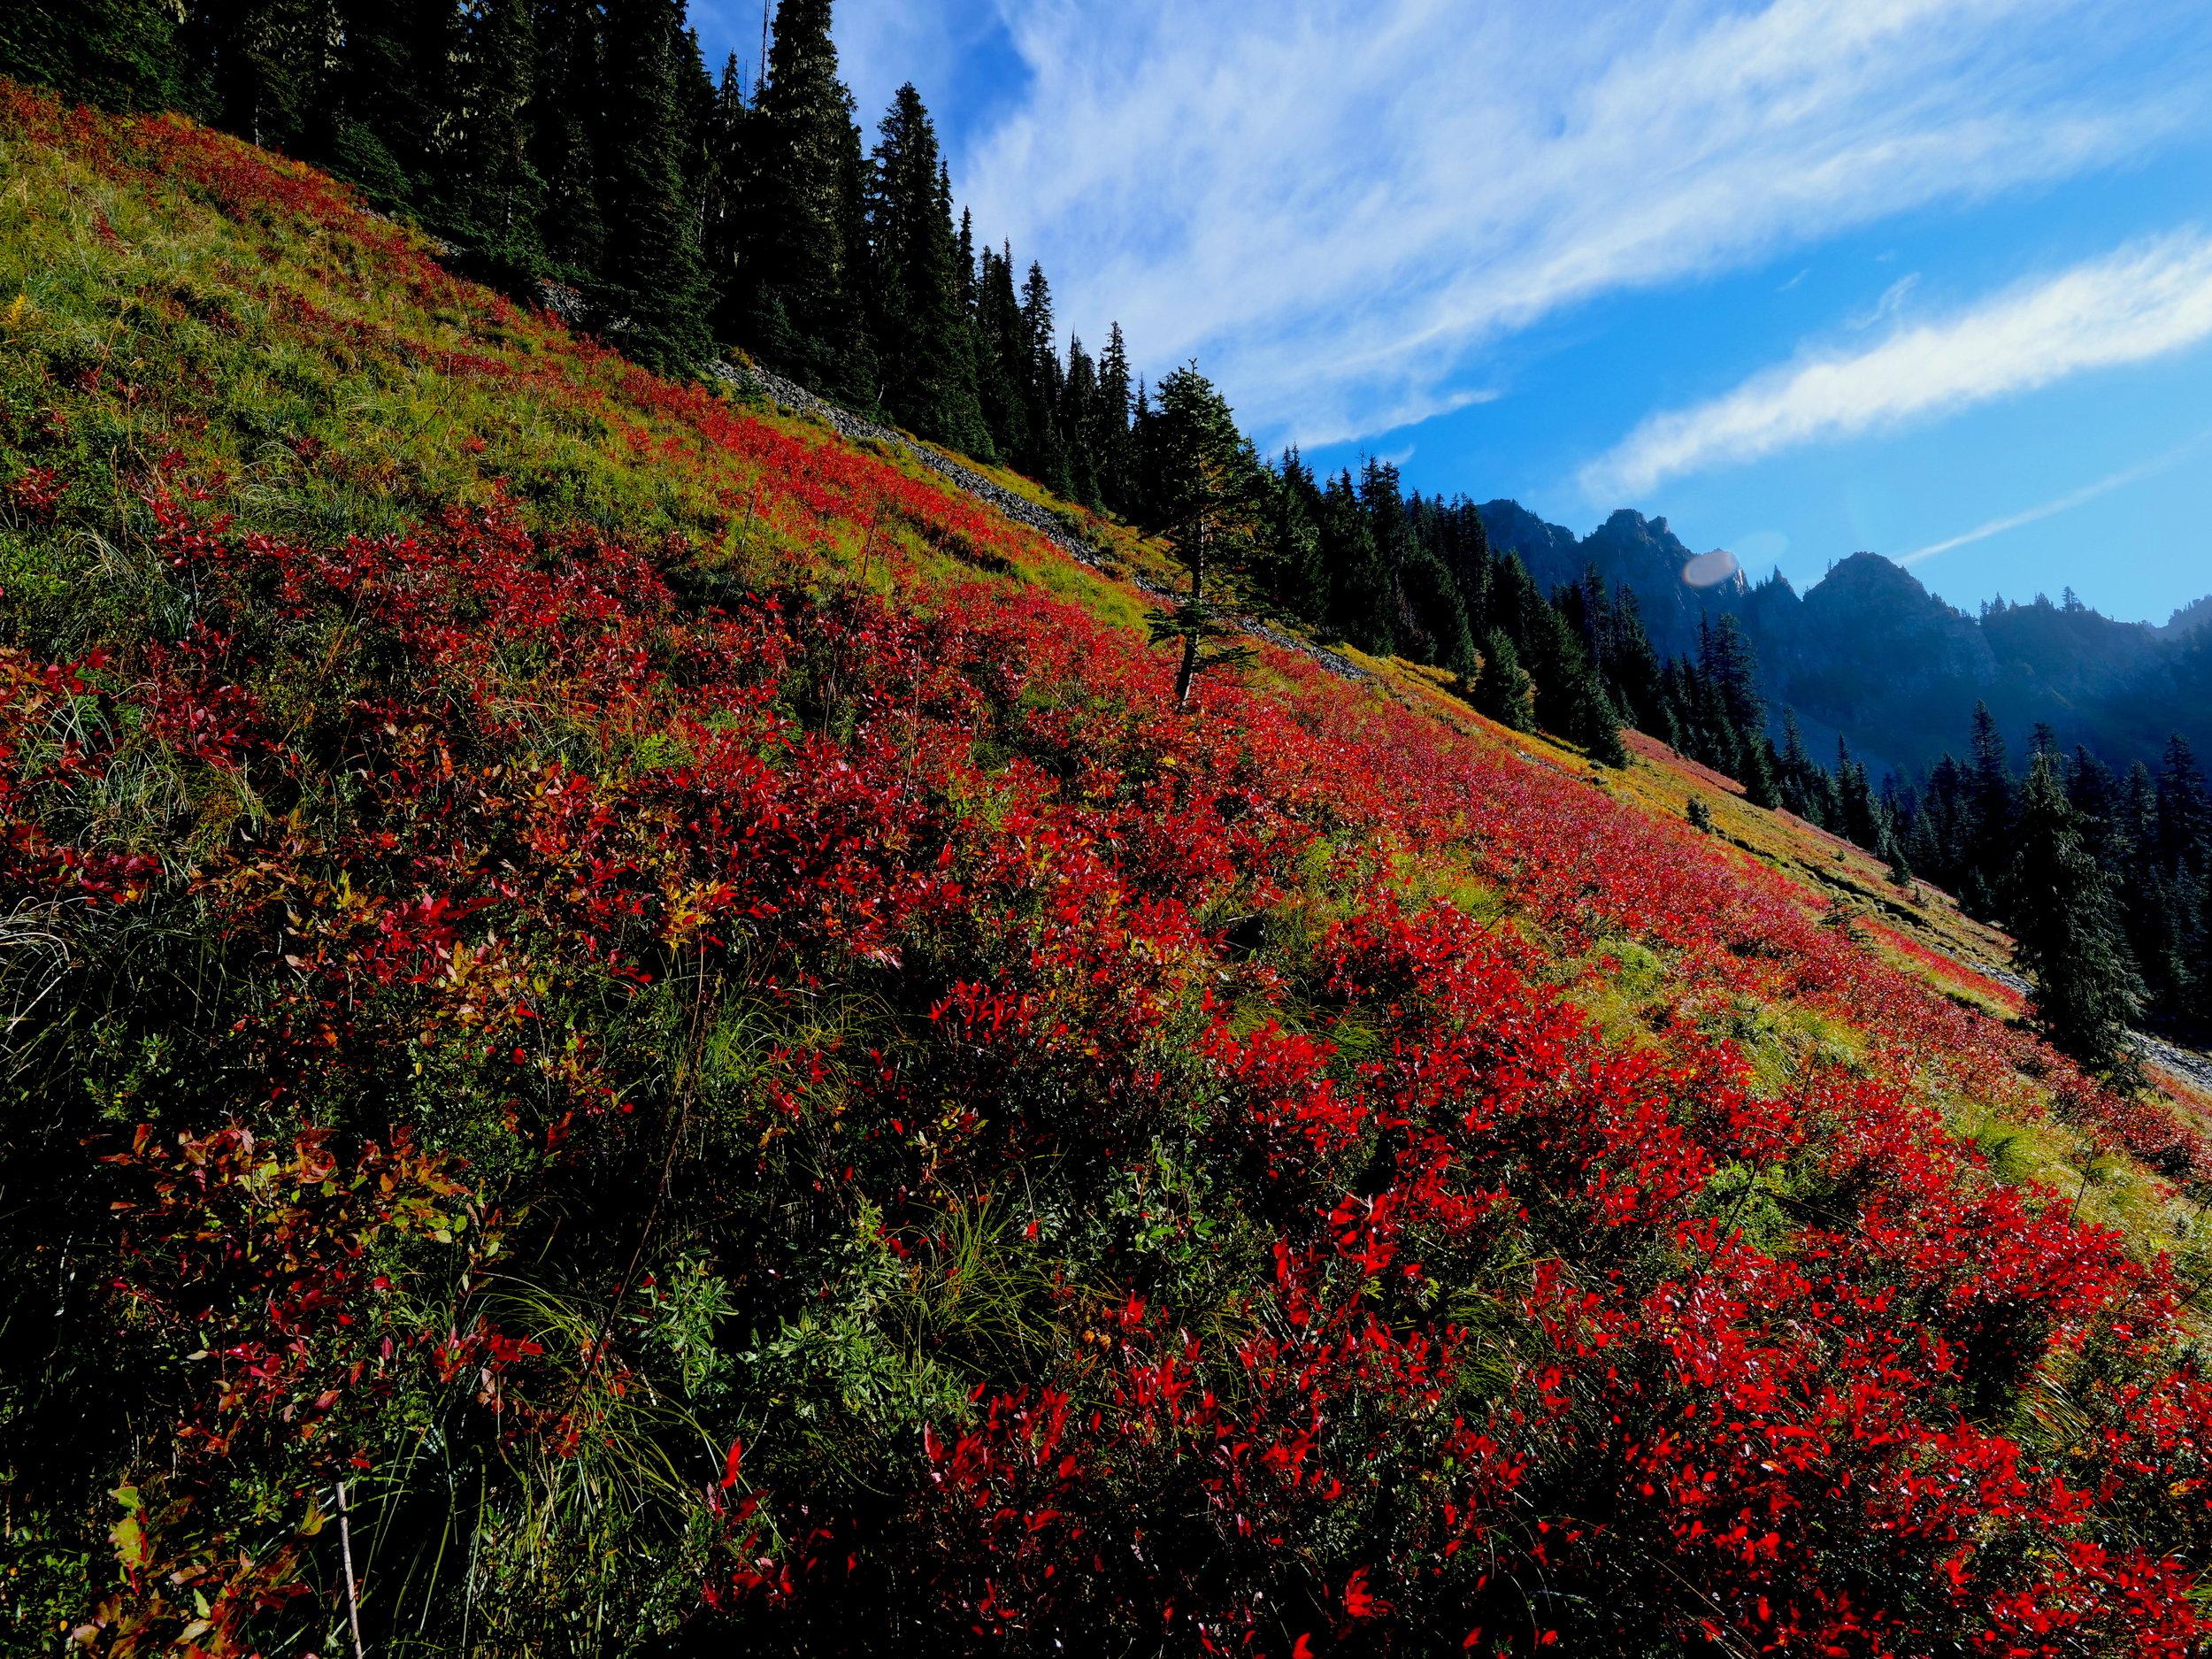 Fall colors on the Eagle Peak Trail, Mt. Rainier National Park